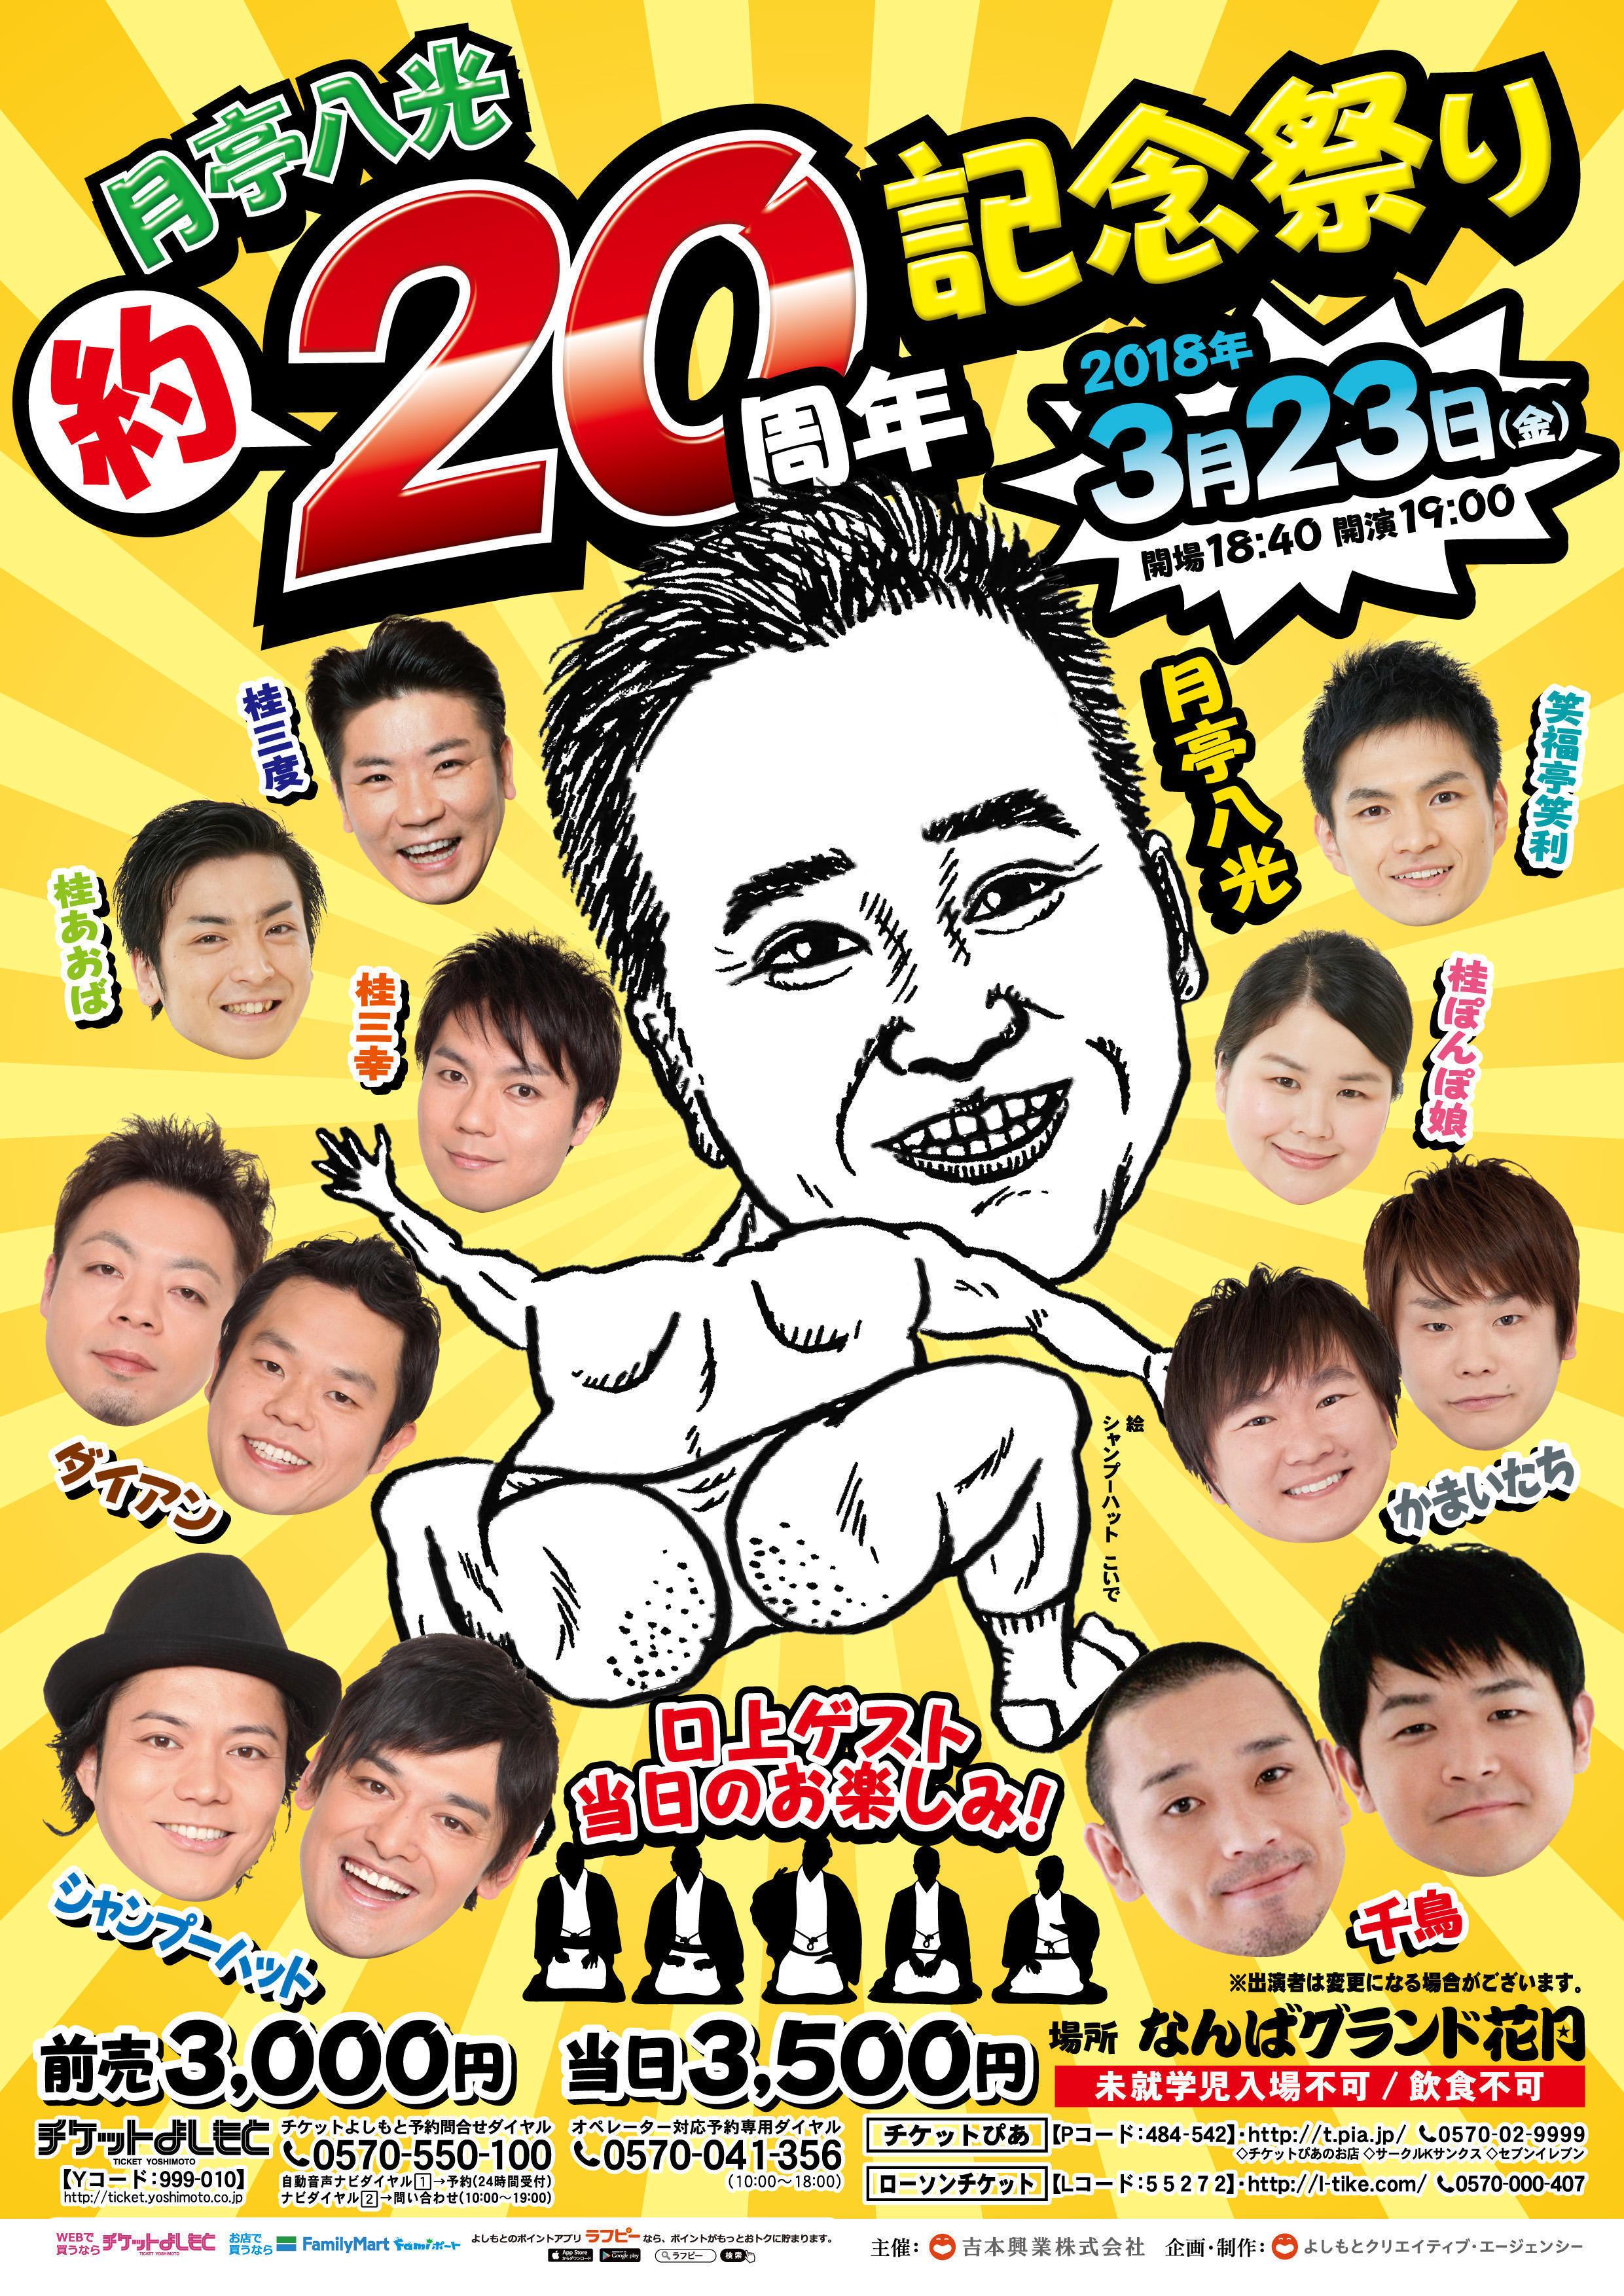 http://news.yoshimoto.co.jp/20180305155518-c78fa0d19c8e58eeaf3bf1ad04243db2ed1385b7.jpg